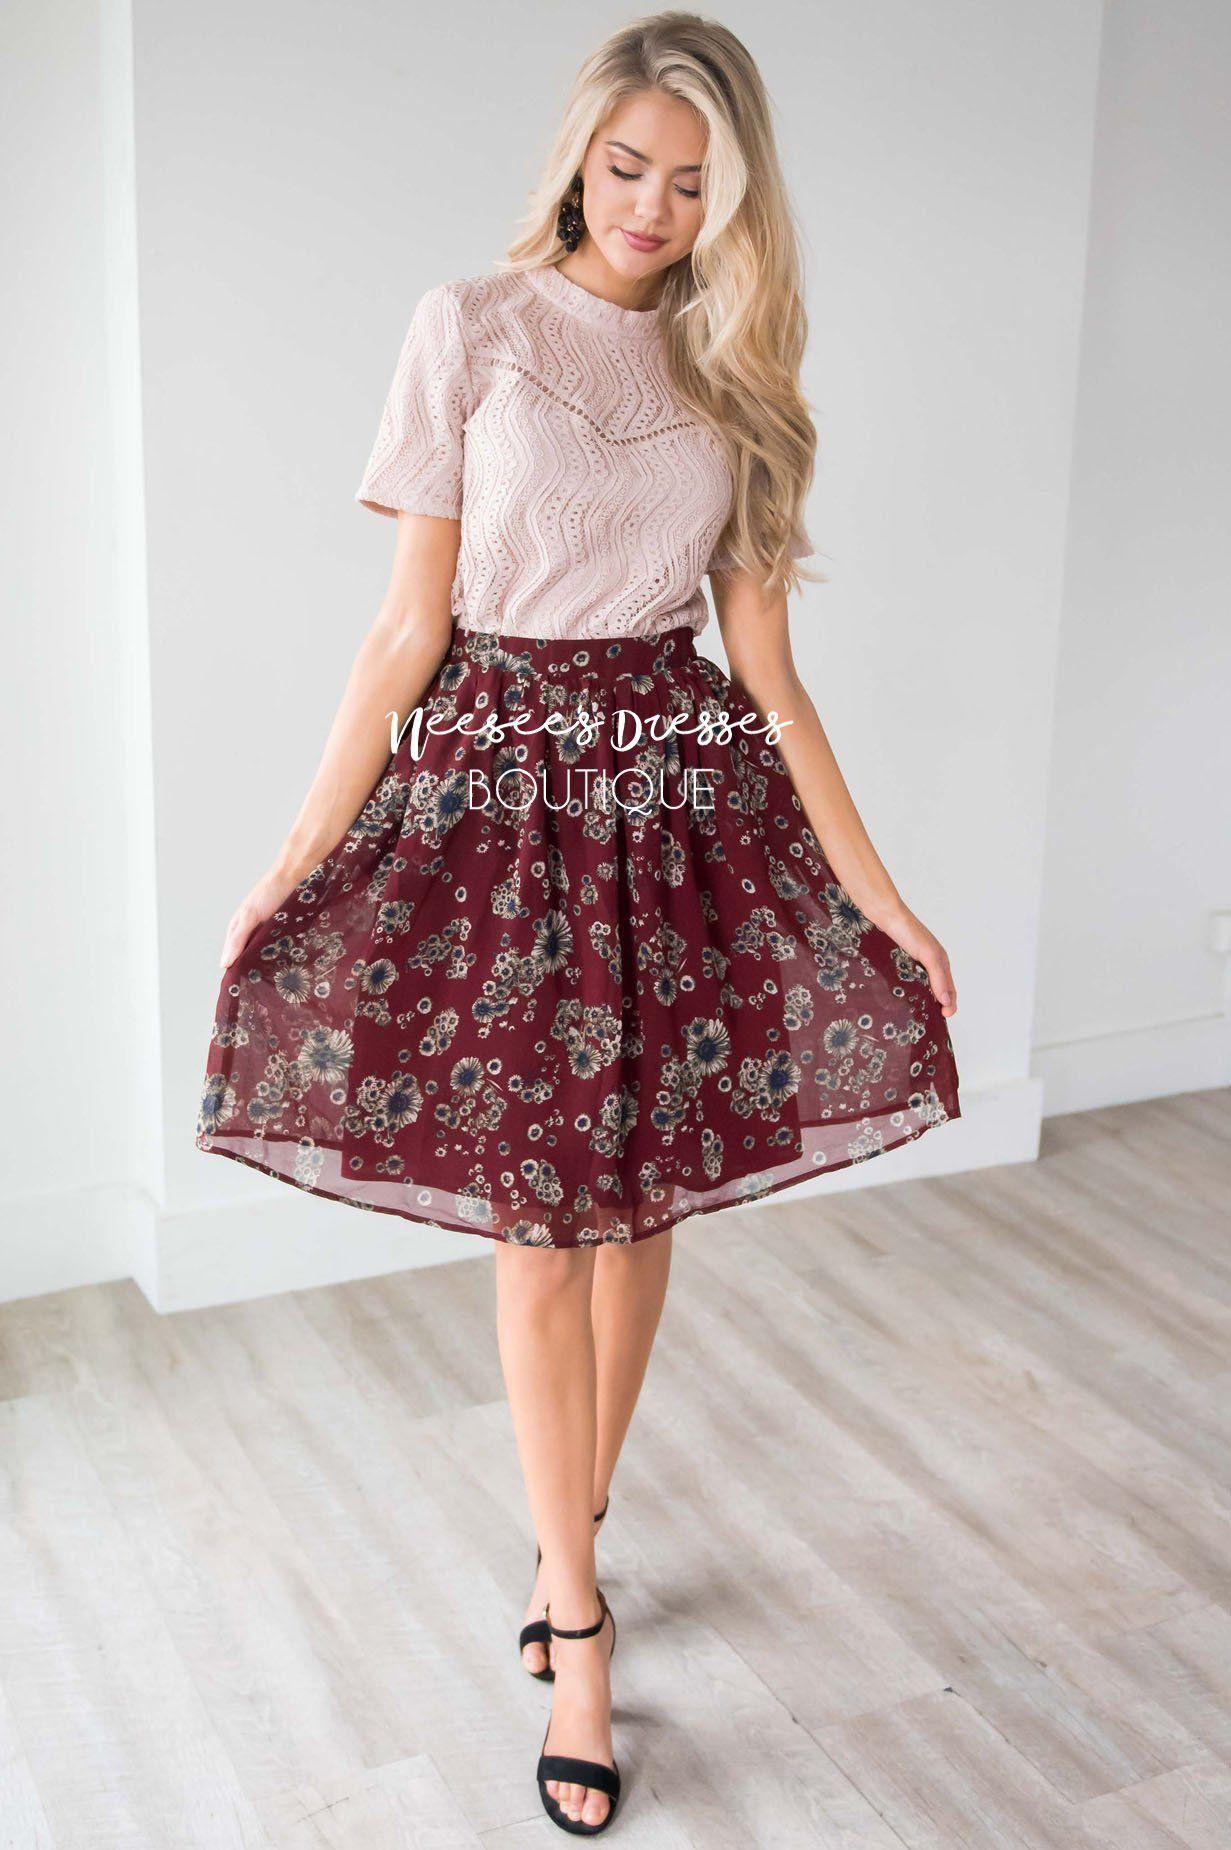 923eddb99f367c Burgundy Cluster Floral Chiffon Skirt for Church | Modest Bridesmaids  Dresses | Modest Dresses and Skirts for Church - Neesee's Dresses